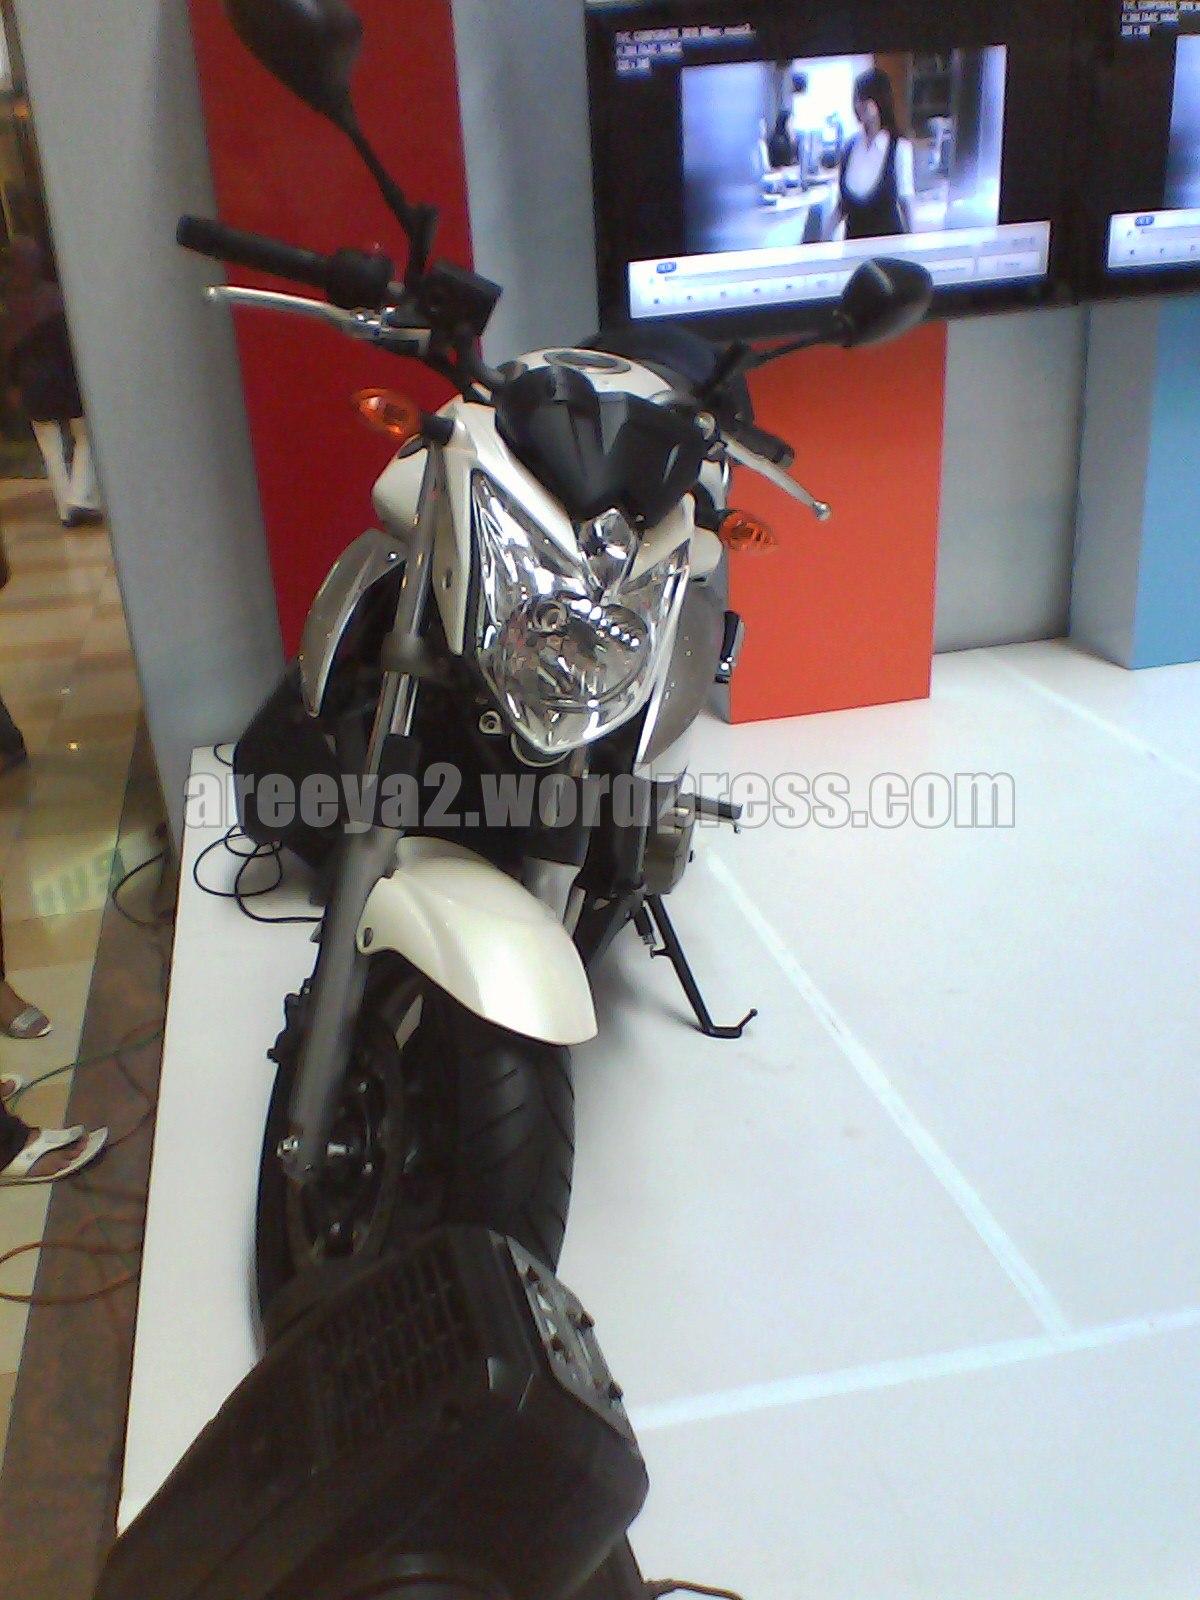 Modifikasi Motor Yamaha Byson Simple Tapi Keren Motor Yamaha Byson